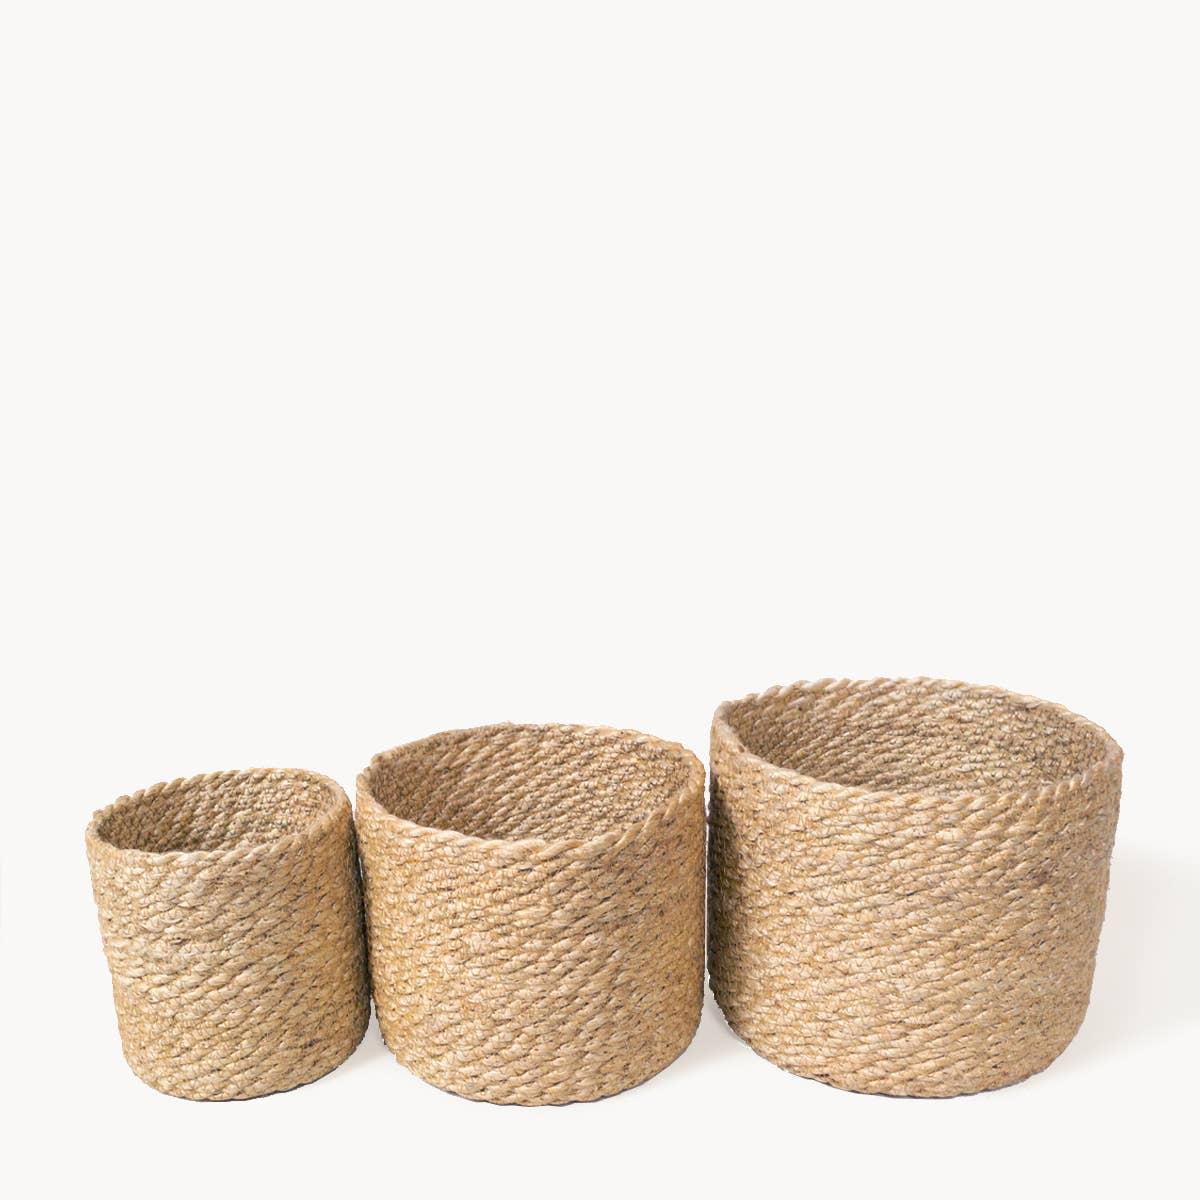 Kata Bin (Set of 3) | Trada Marketplace